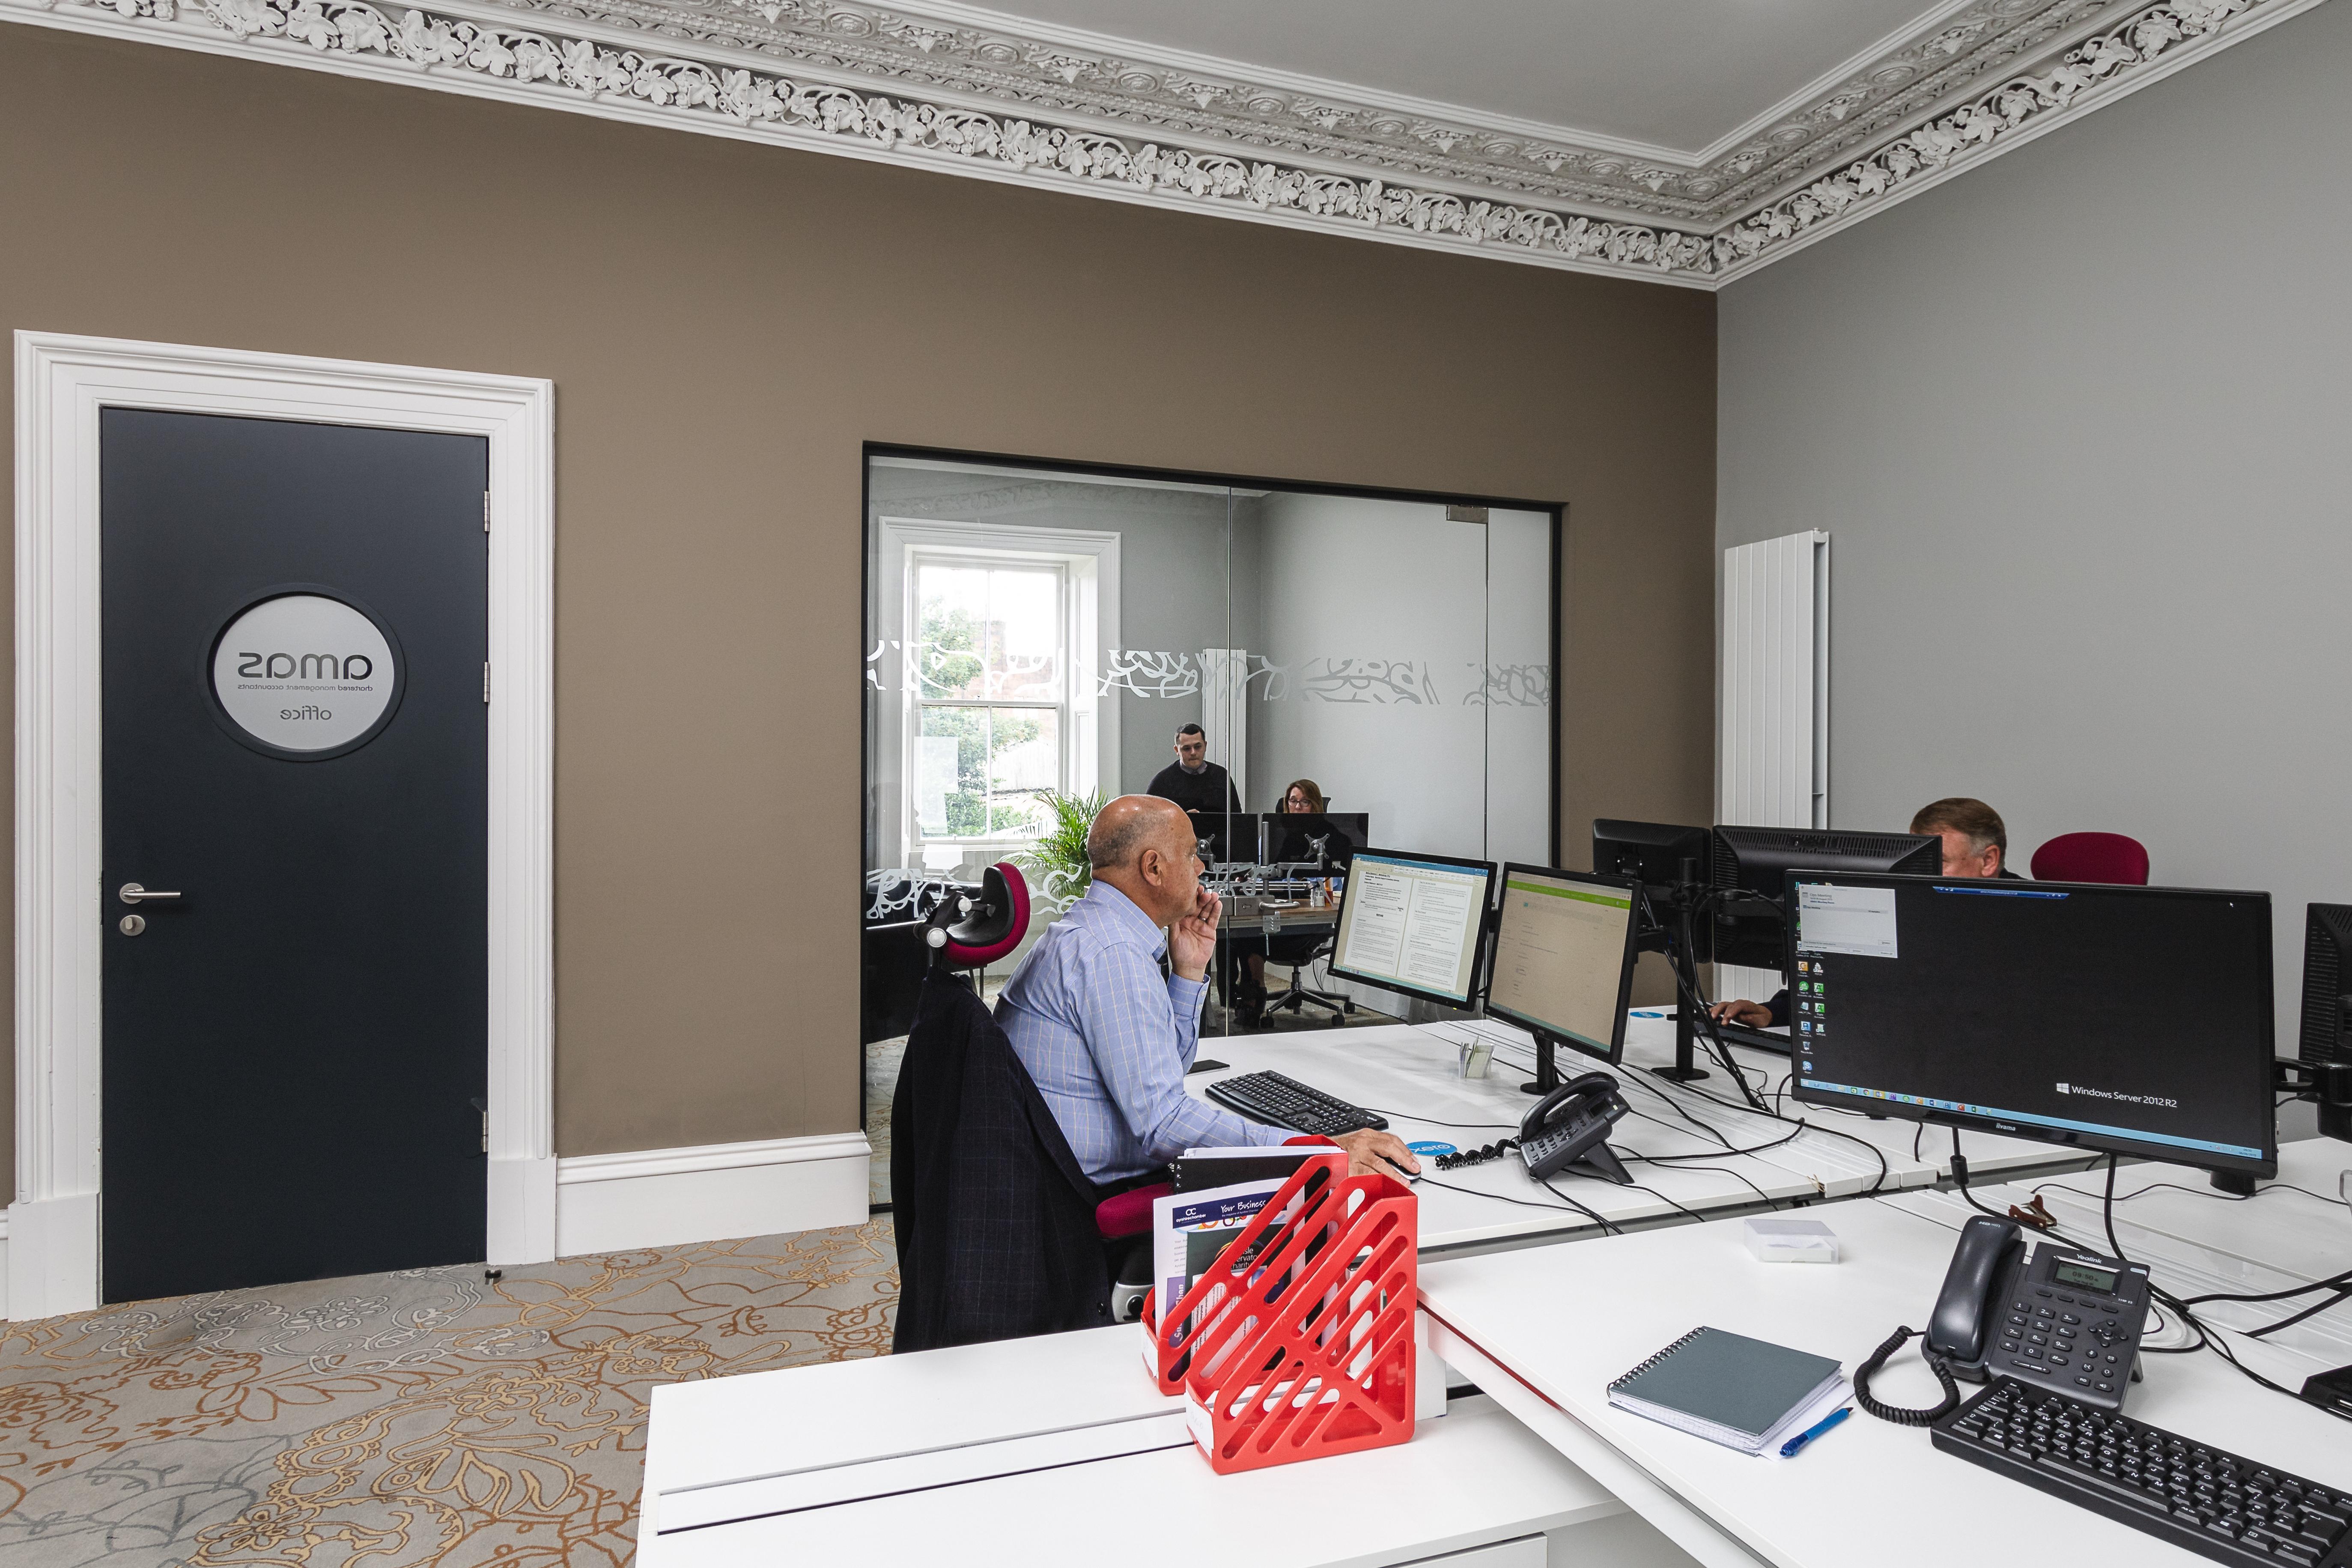 AMAS Accounting Office and At Work Shots Copyright 2019 @cursetheseeyes-2